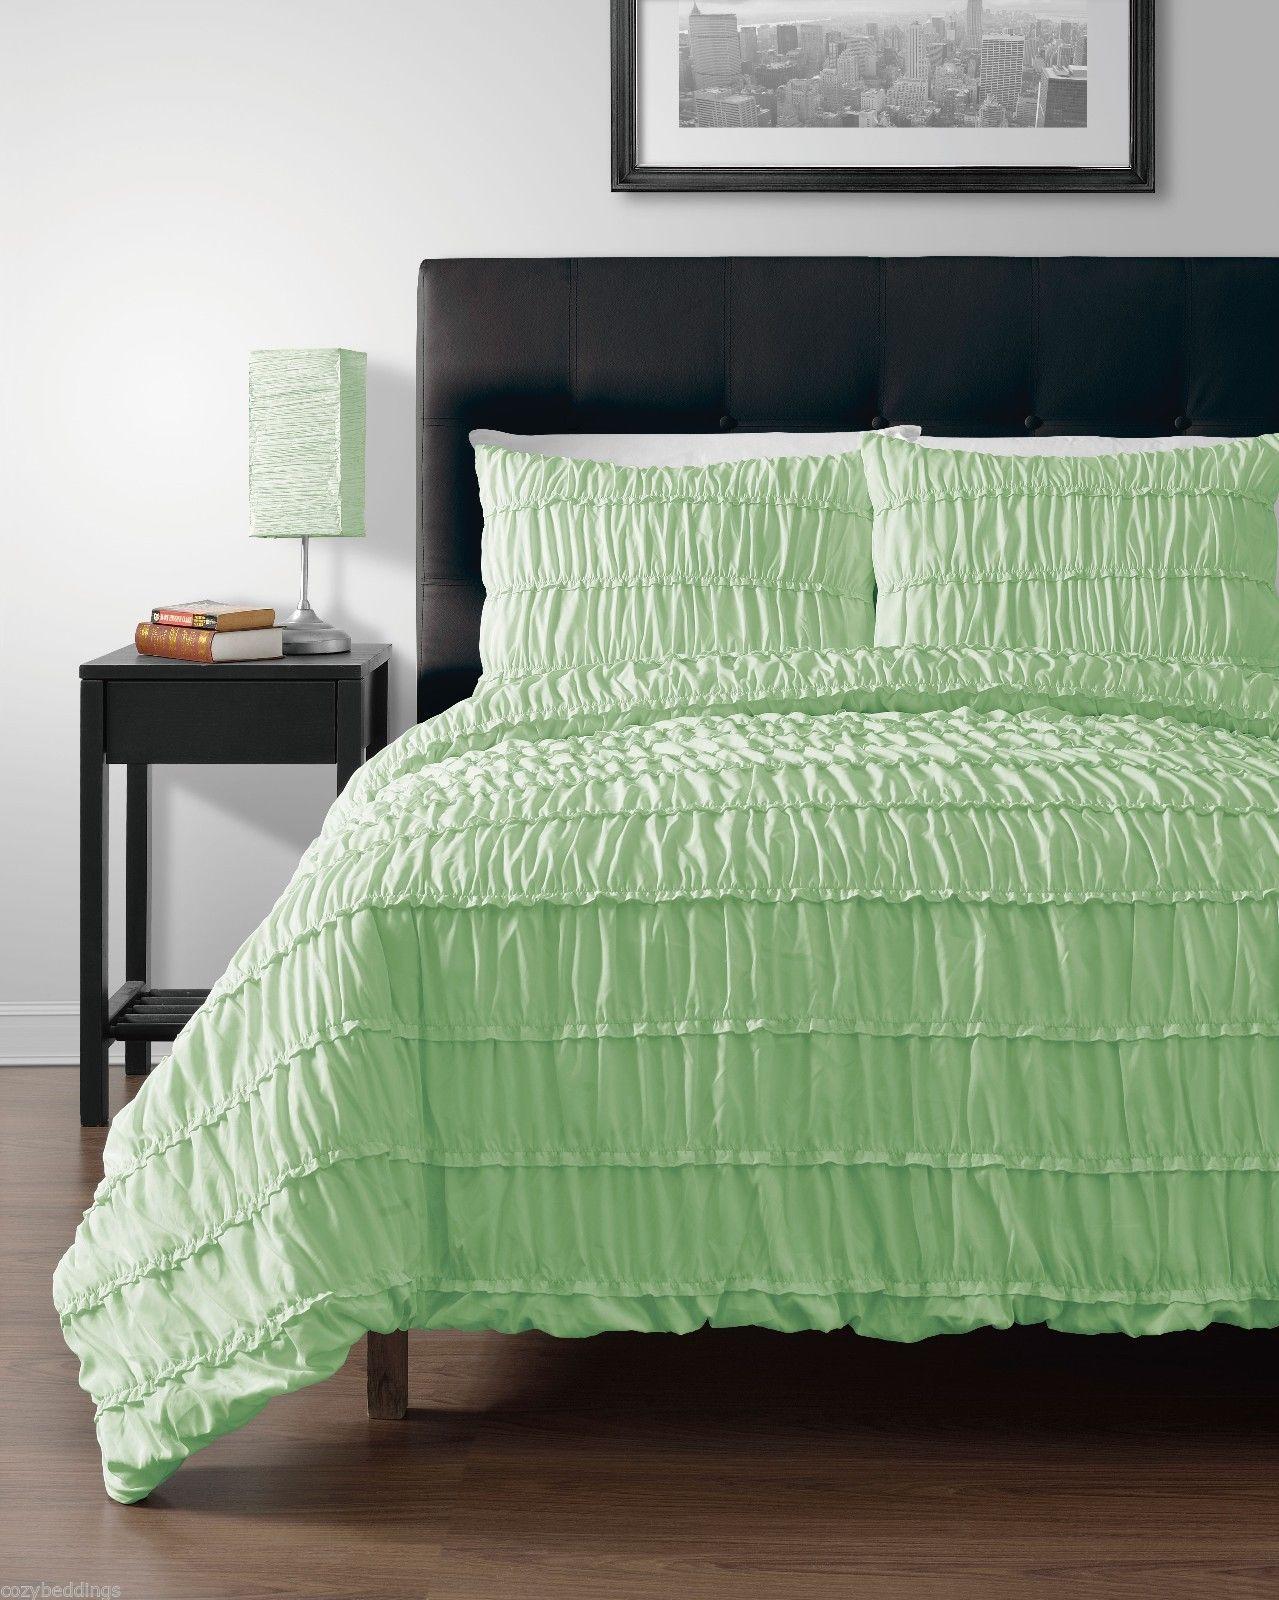 pinzon mint green 5pc duvet cover set with duvet insert full size bed cover set duvet covers. Black Bedroom Furniture Sets. Home Design Ideas